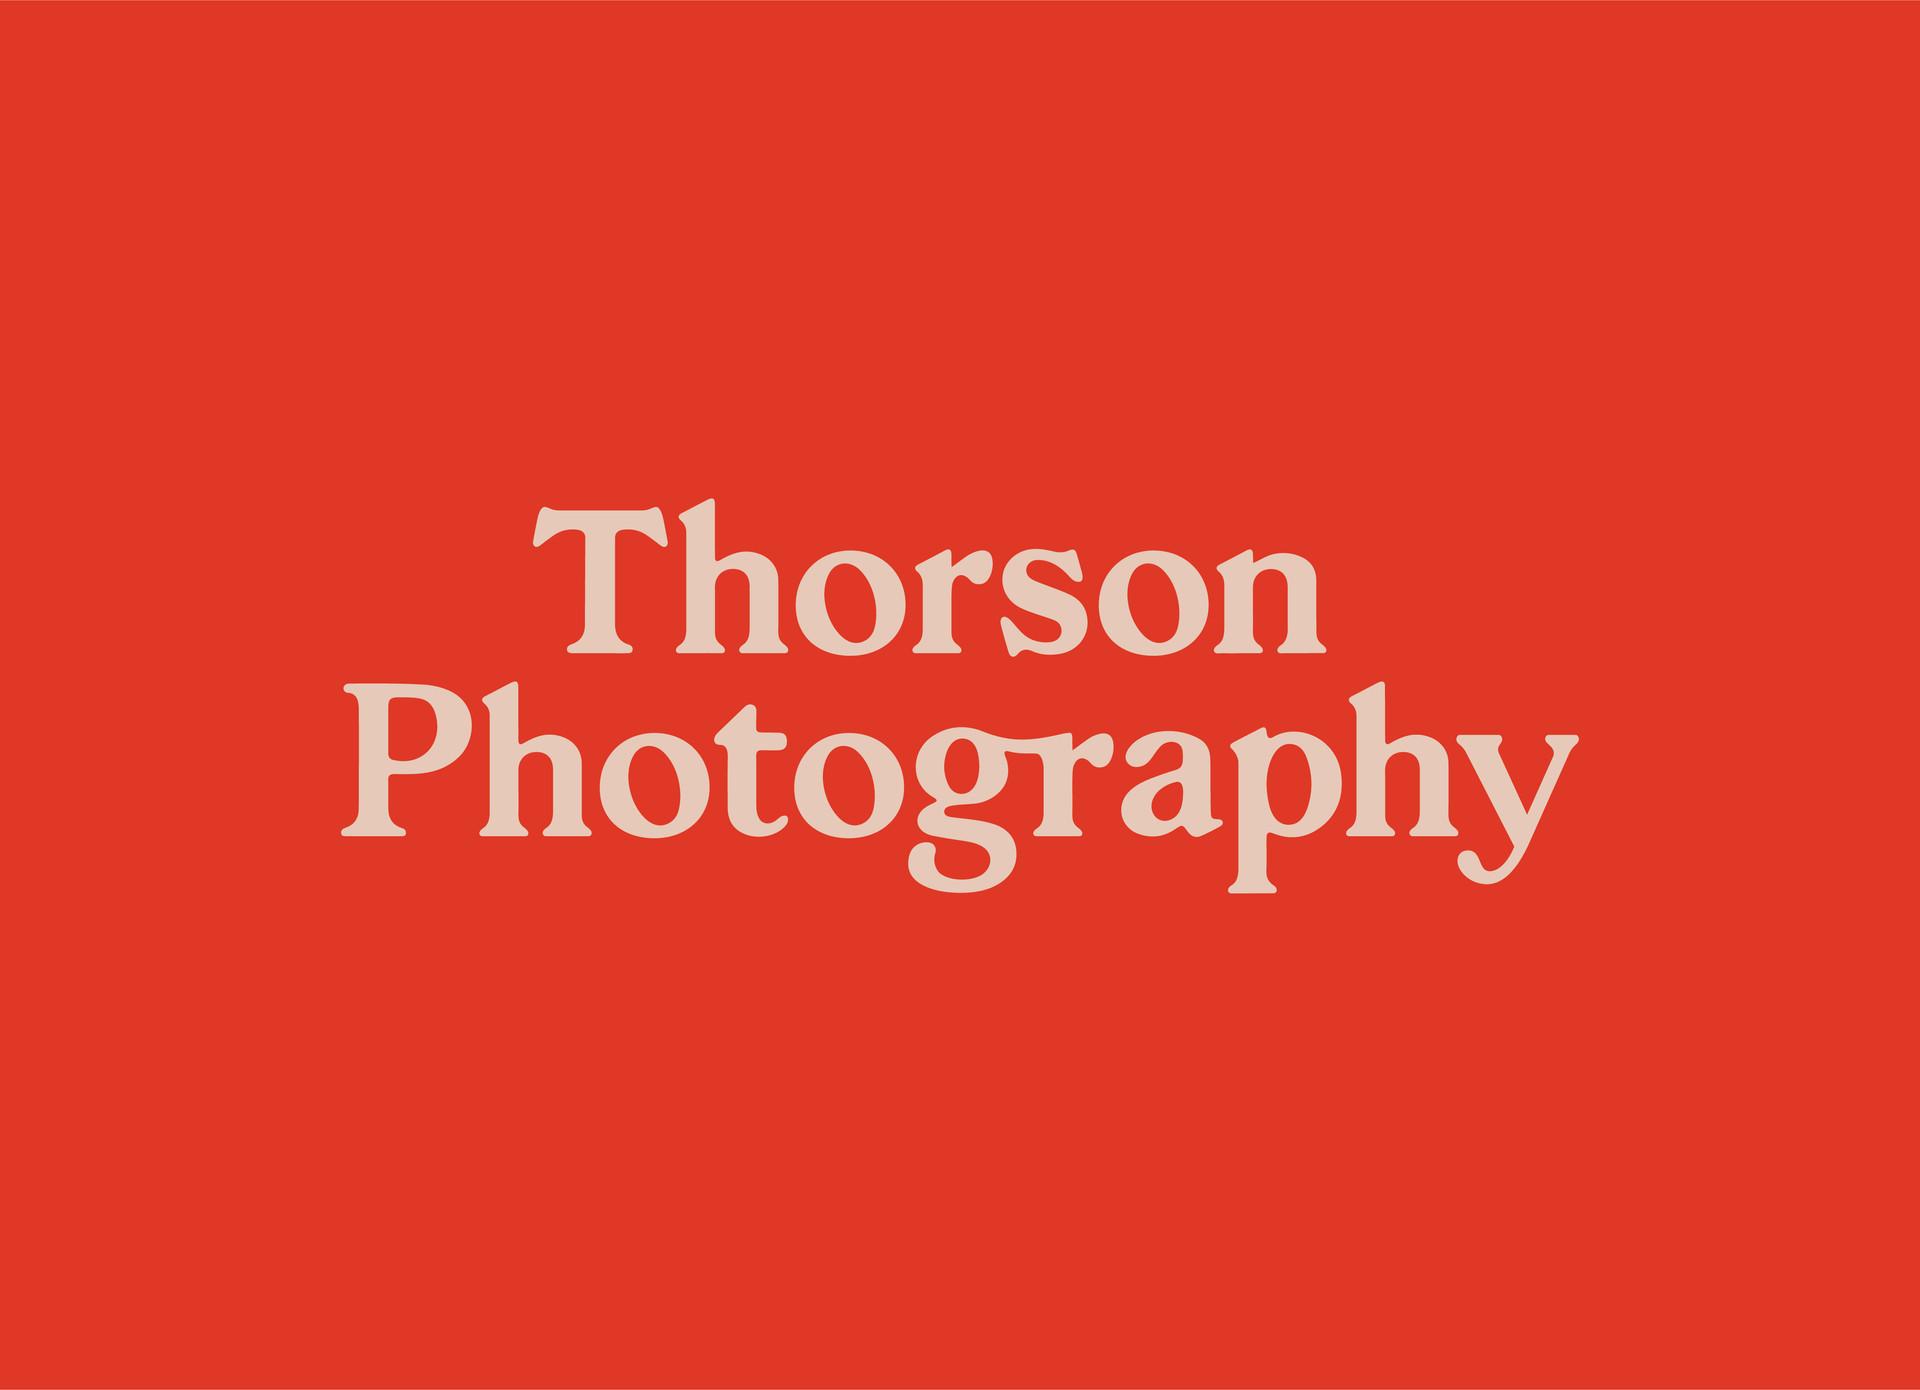 190727_Thorson-01.jpg